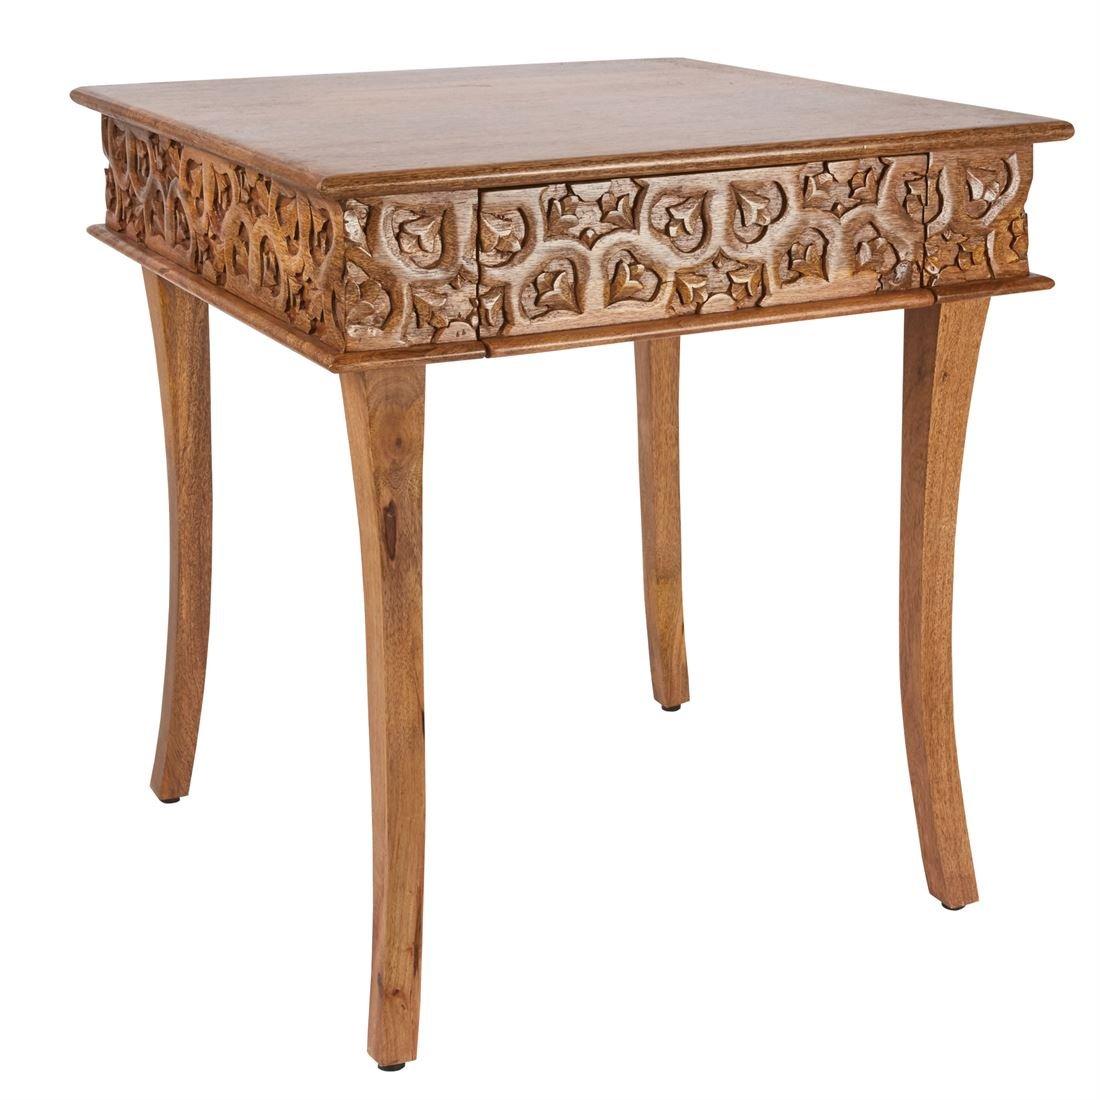 Brylanehome Meena Carved Wood Table (Natural,0) by BrylaneHome